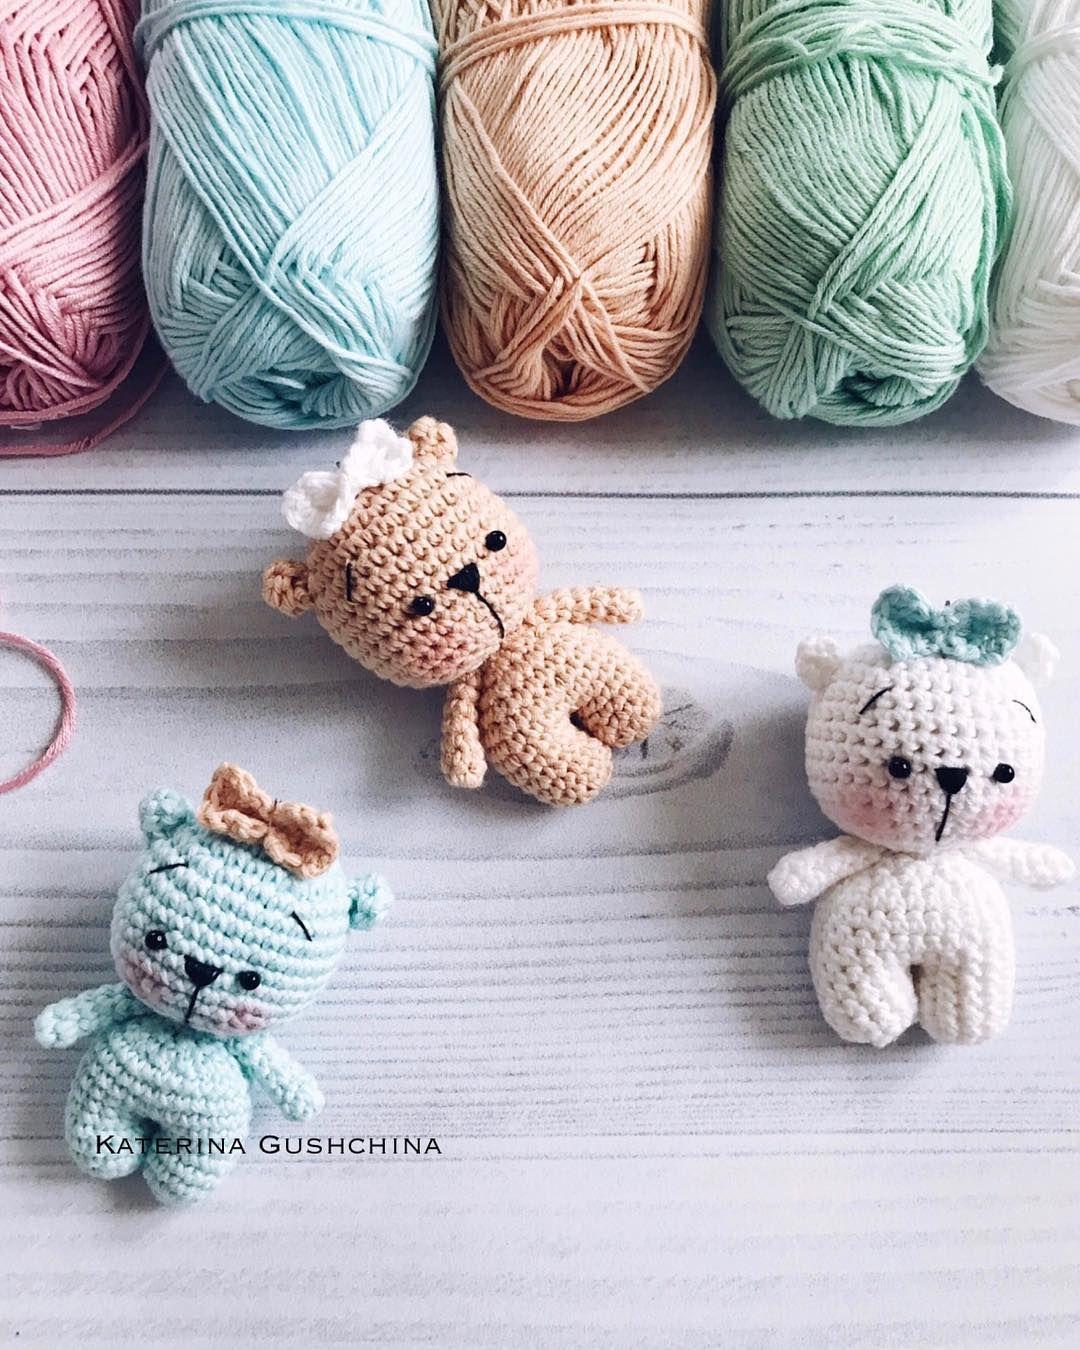 Tiny teddy bear crochet pattern #crochetanimals